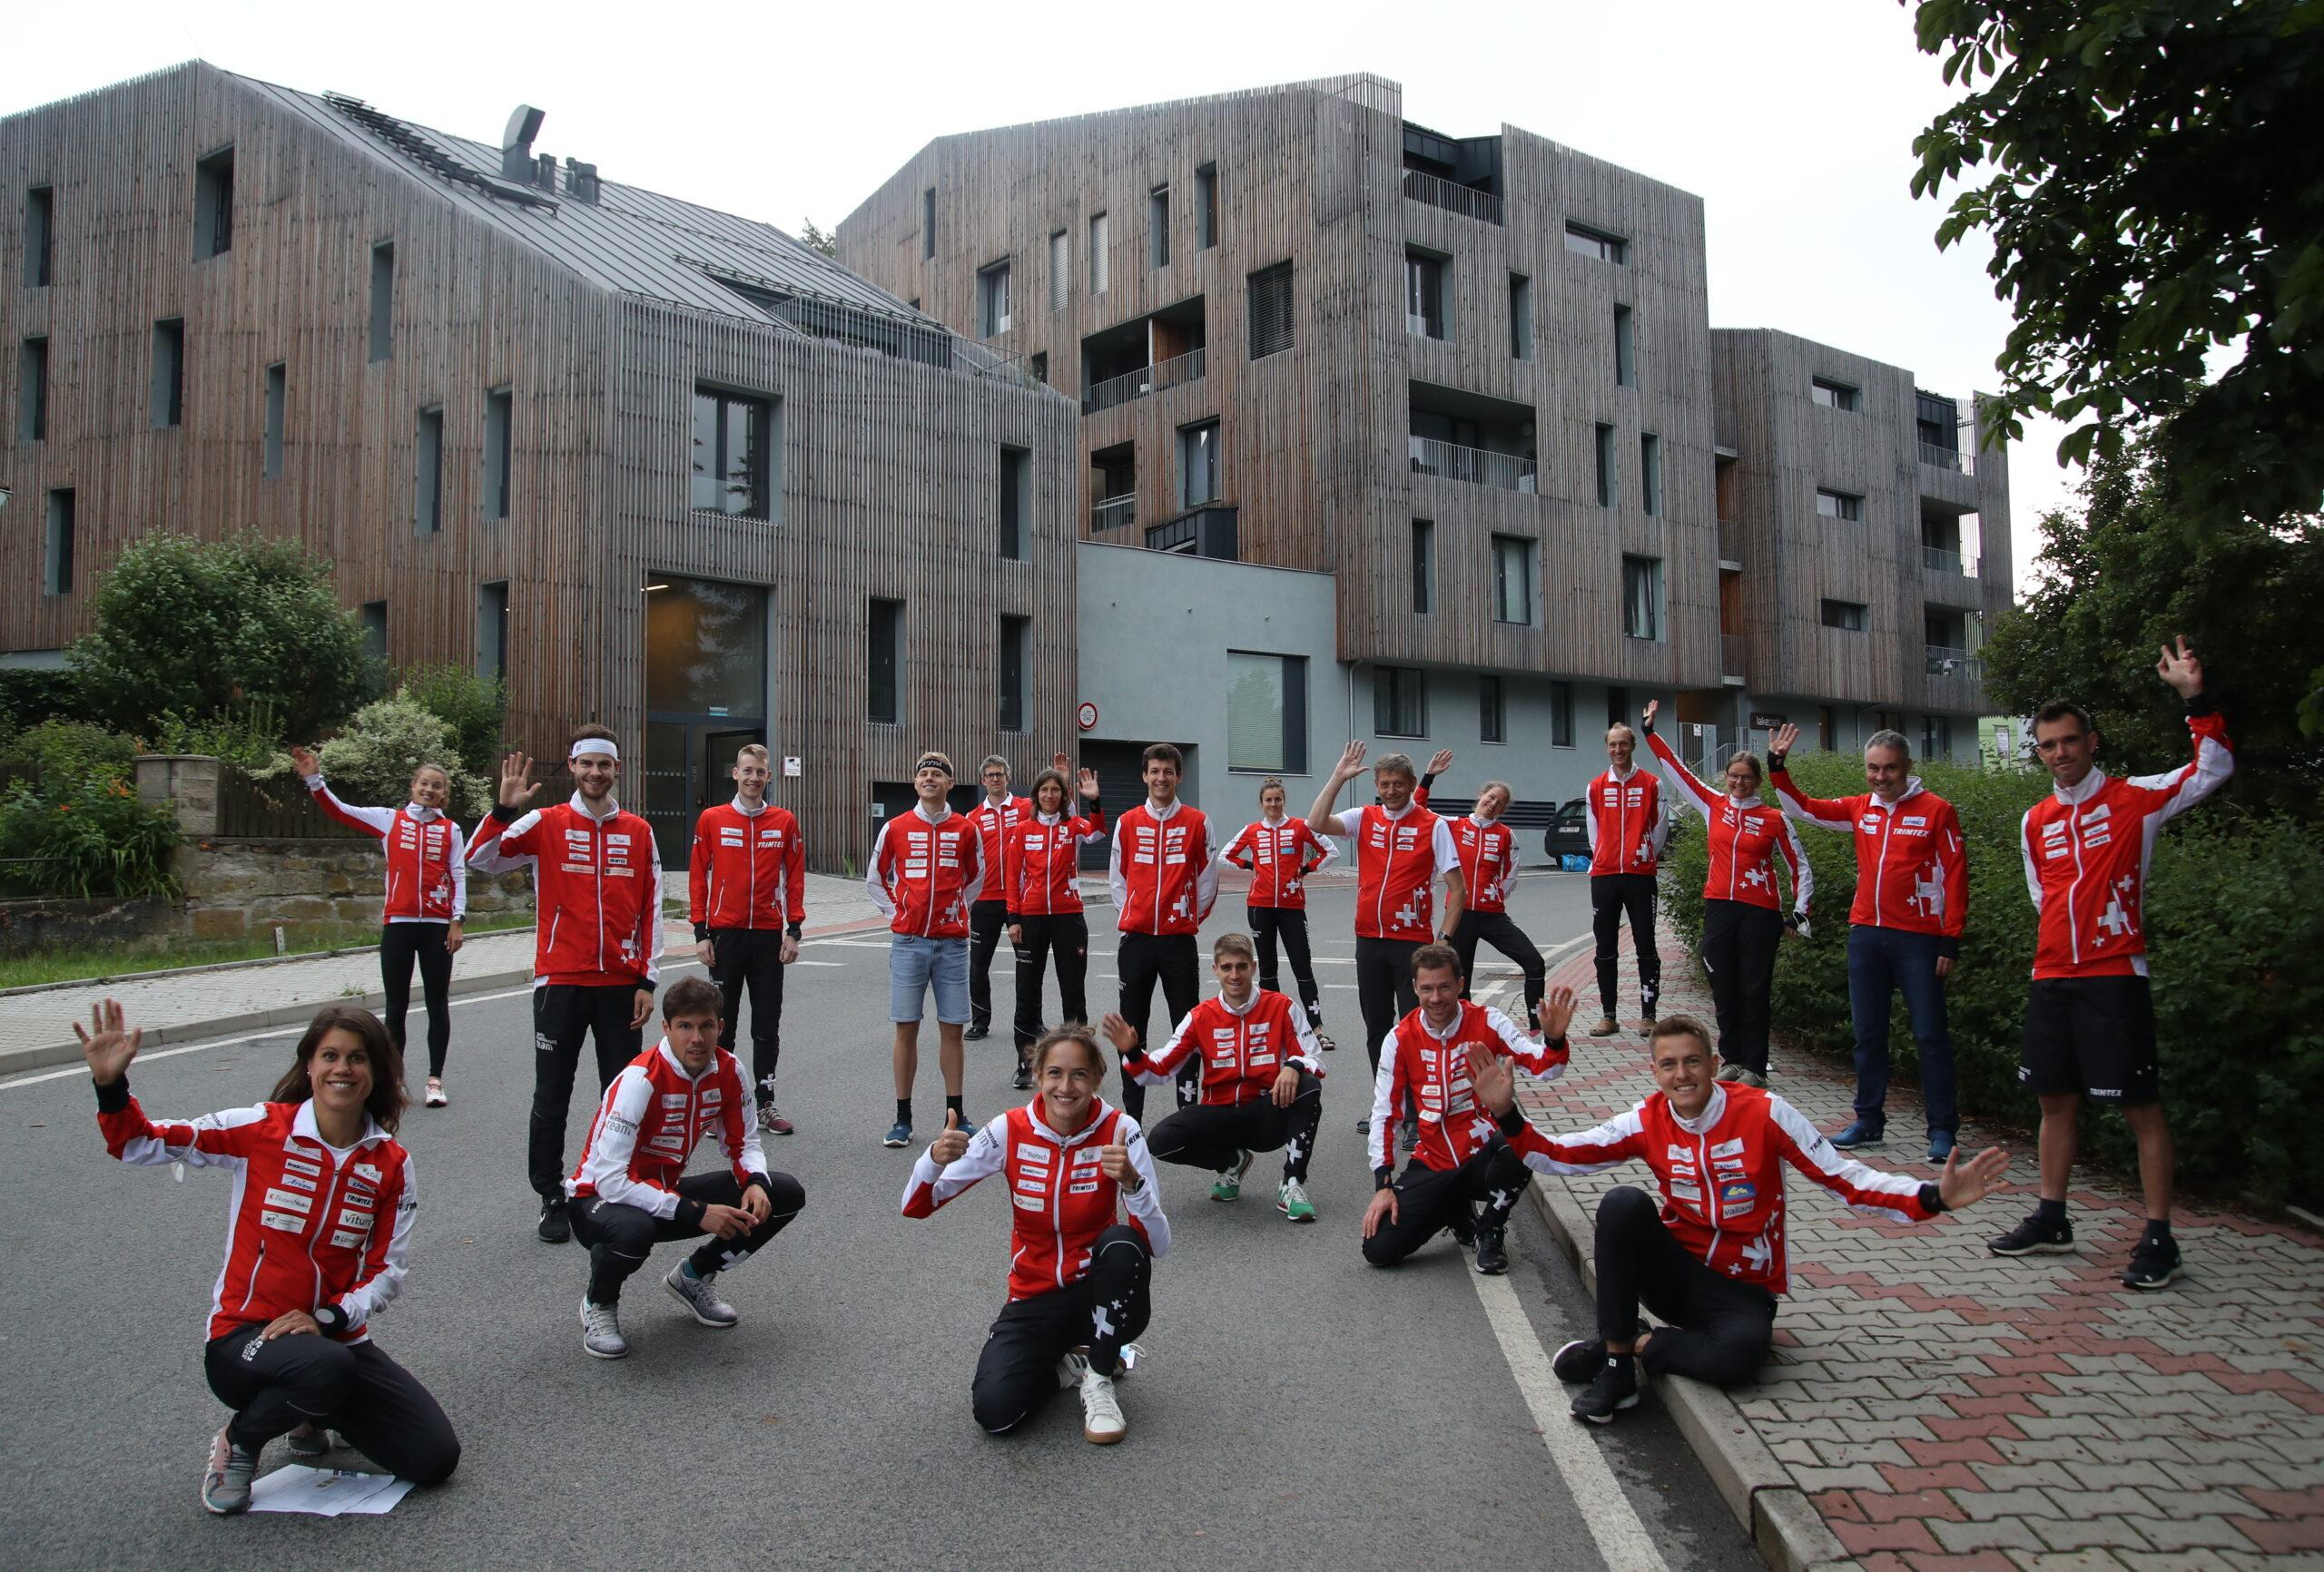 The Swiss Orienteering National Team (in front of Lakepark Residence in Stare Splavy)